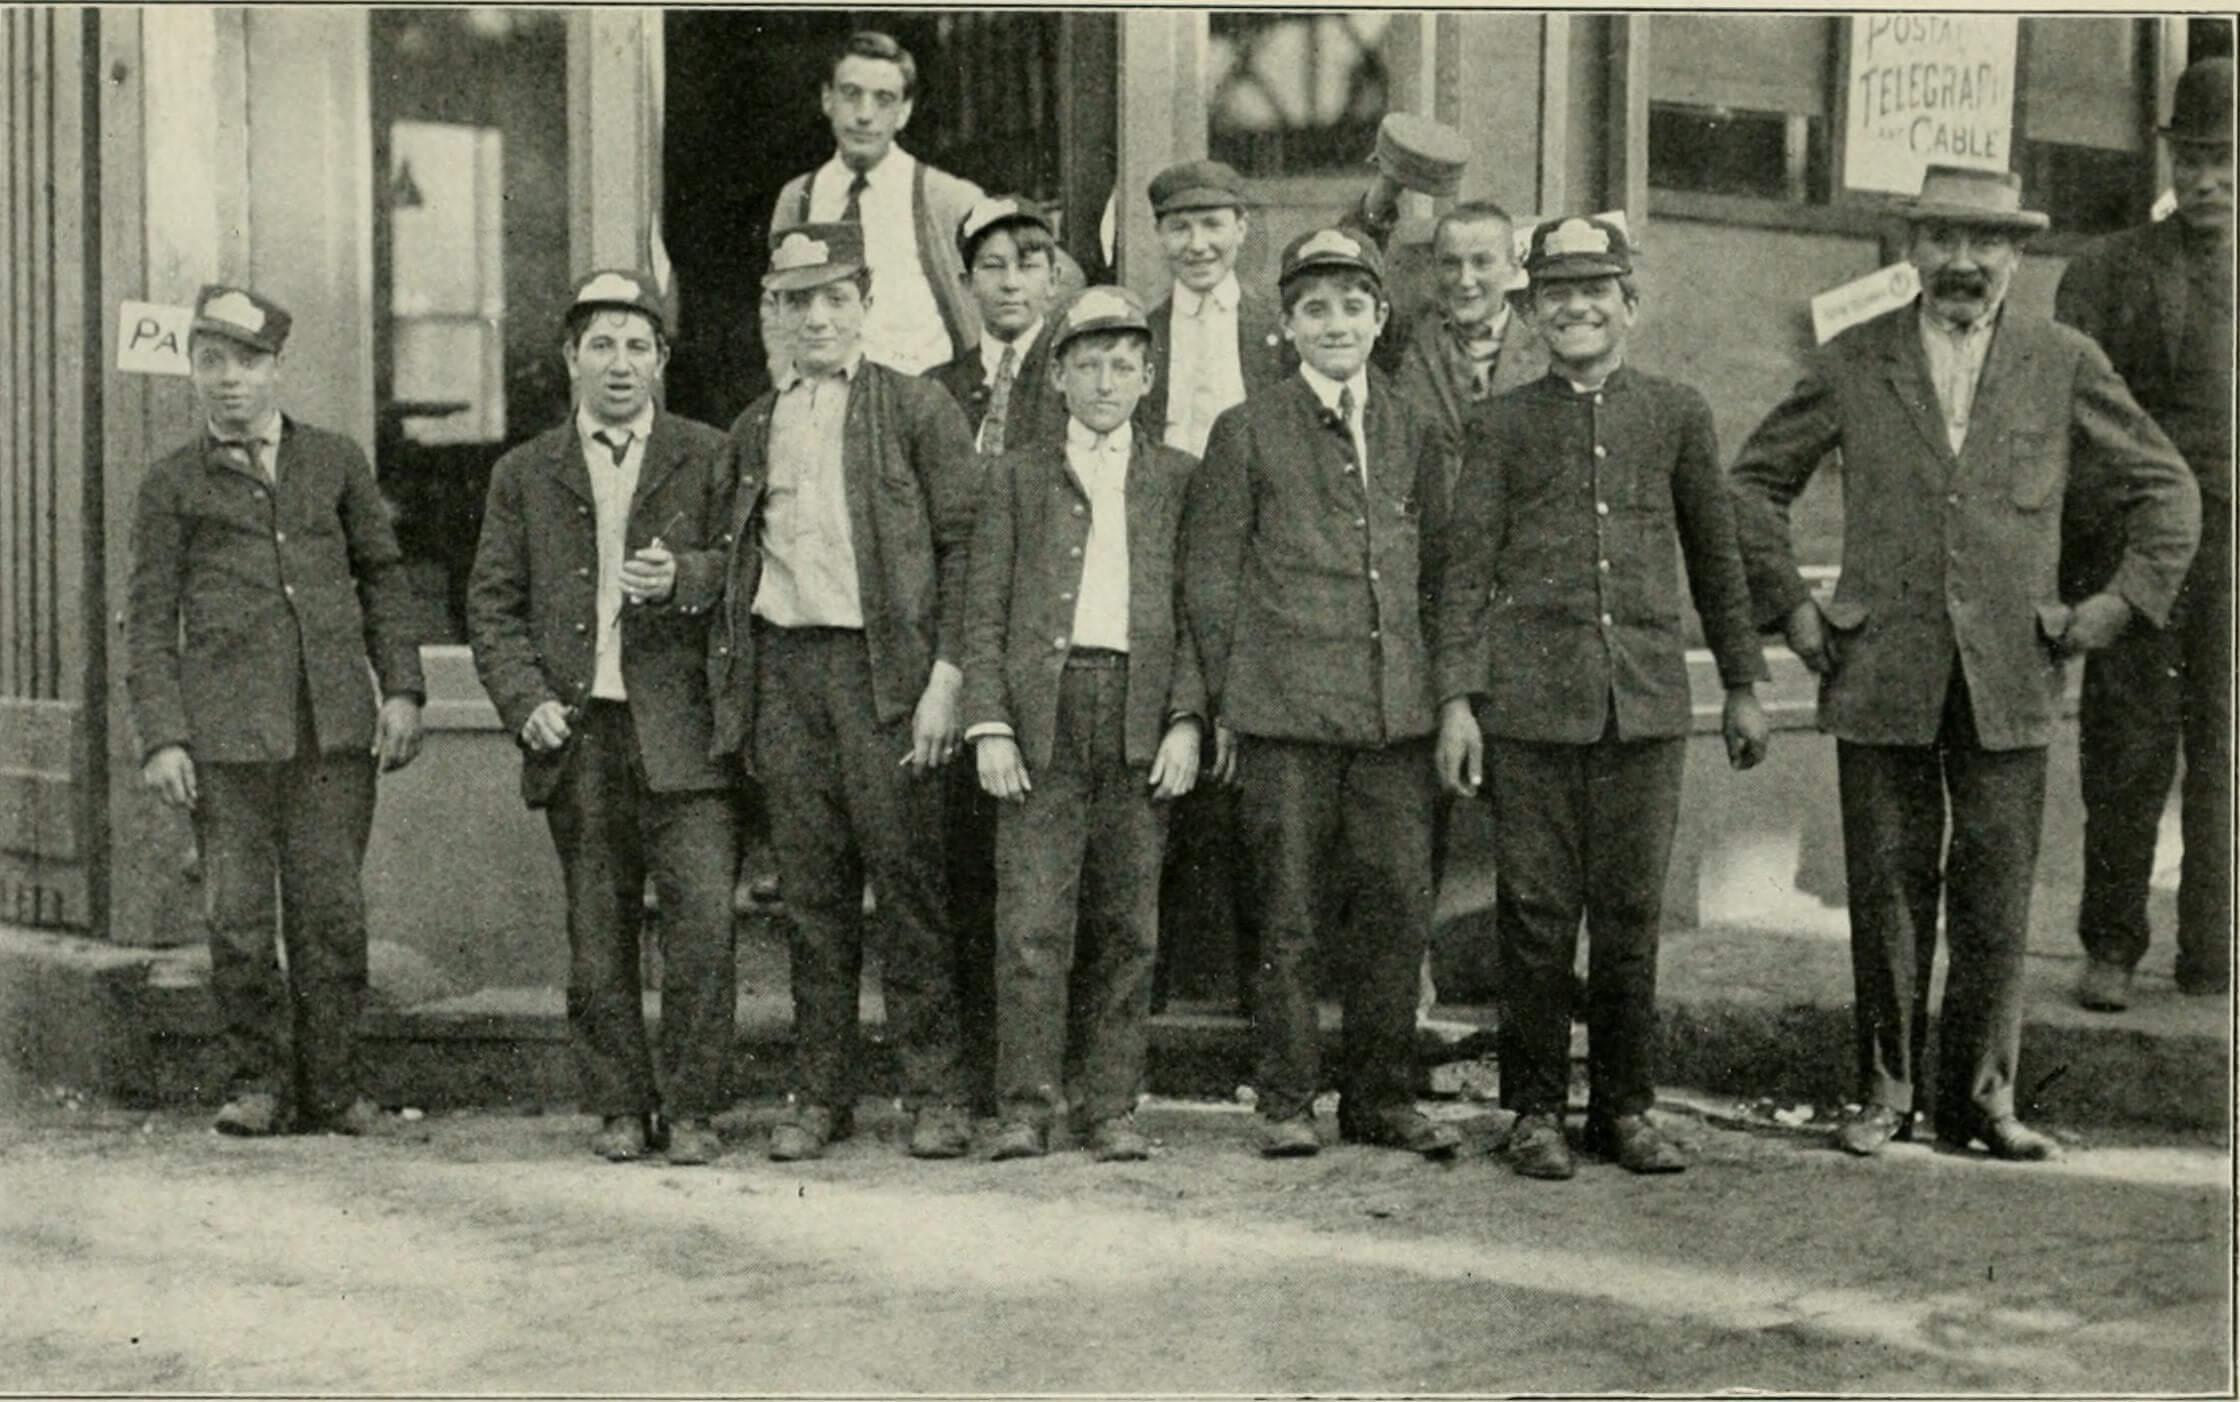 representative pictures of 1915 footwear and cultural disparity